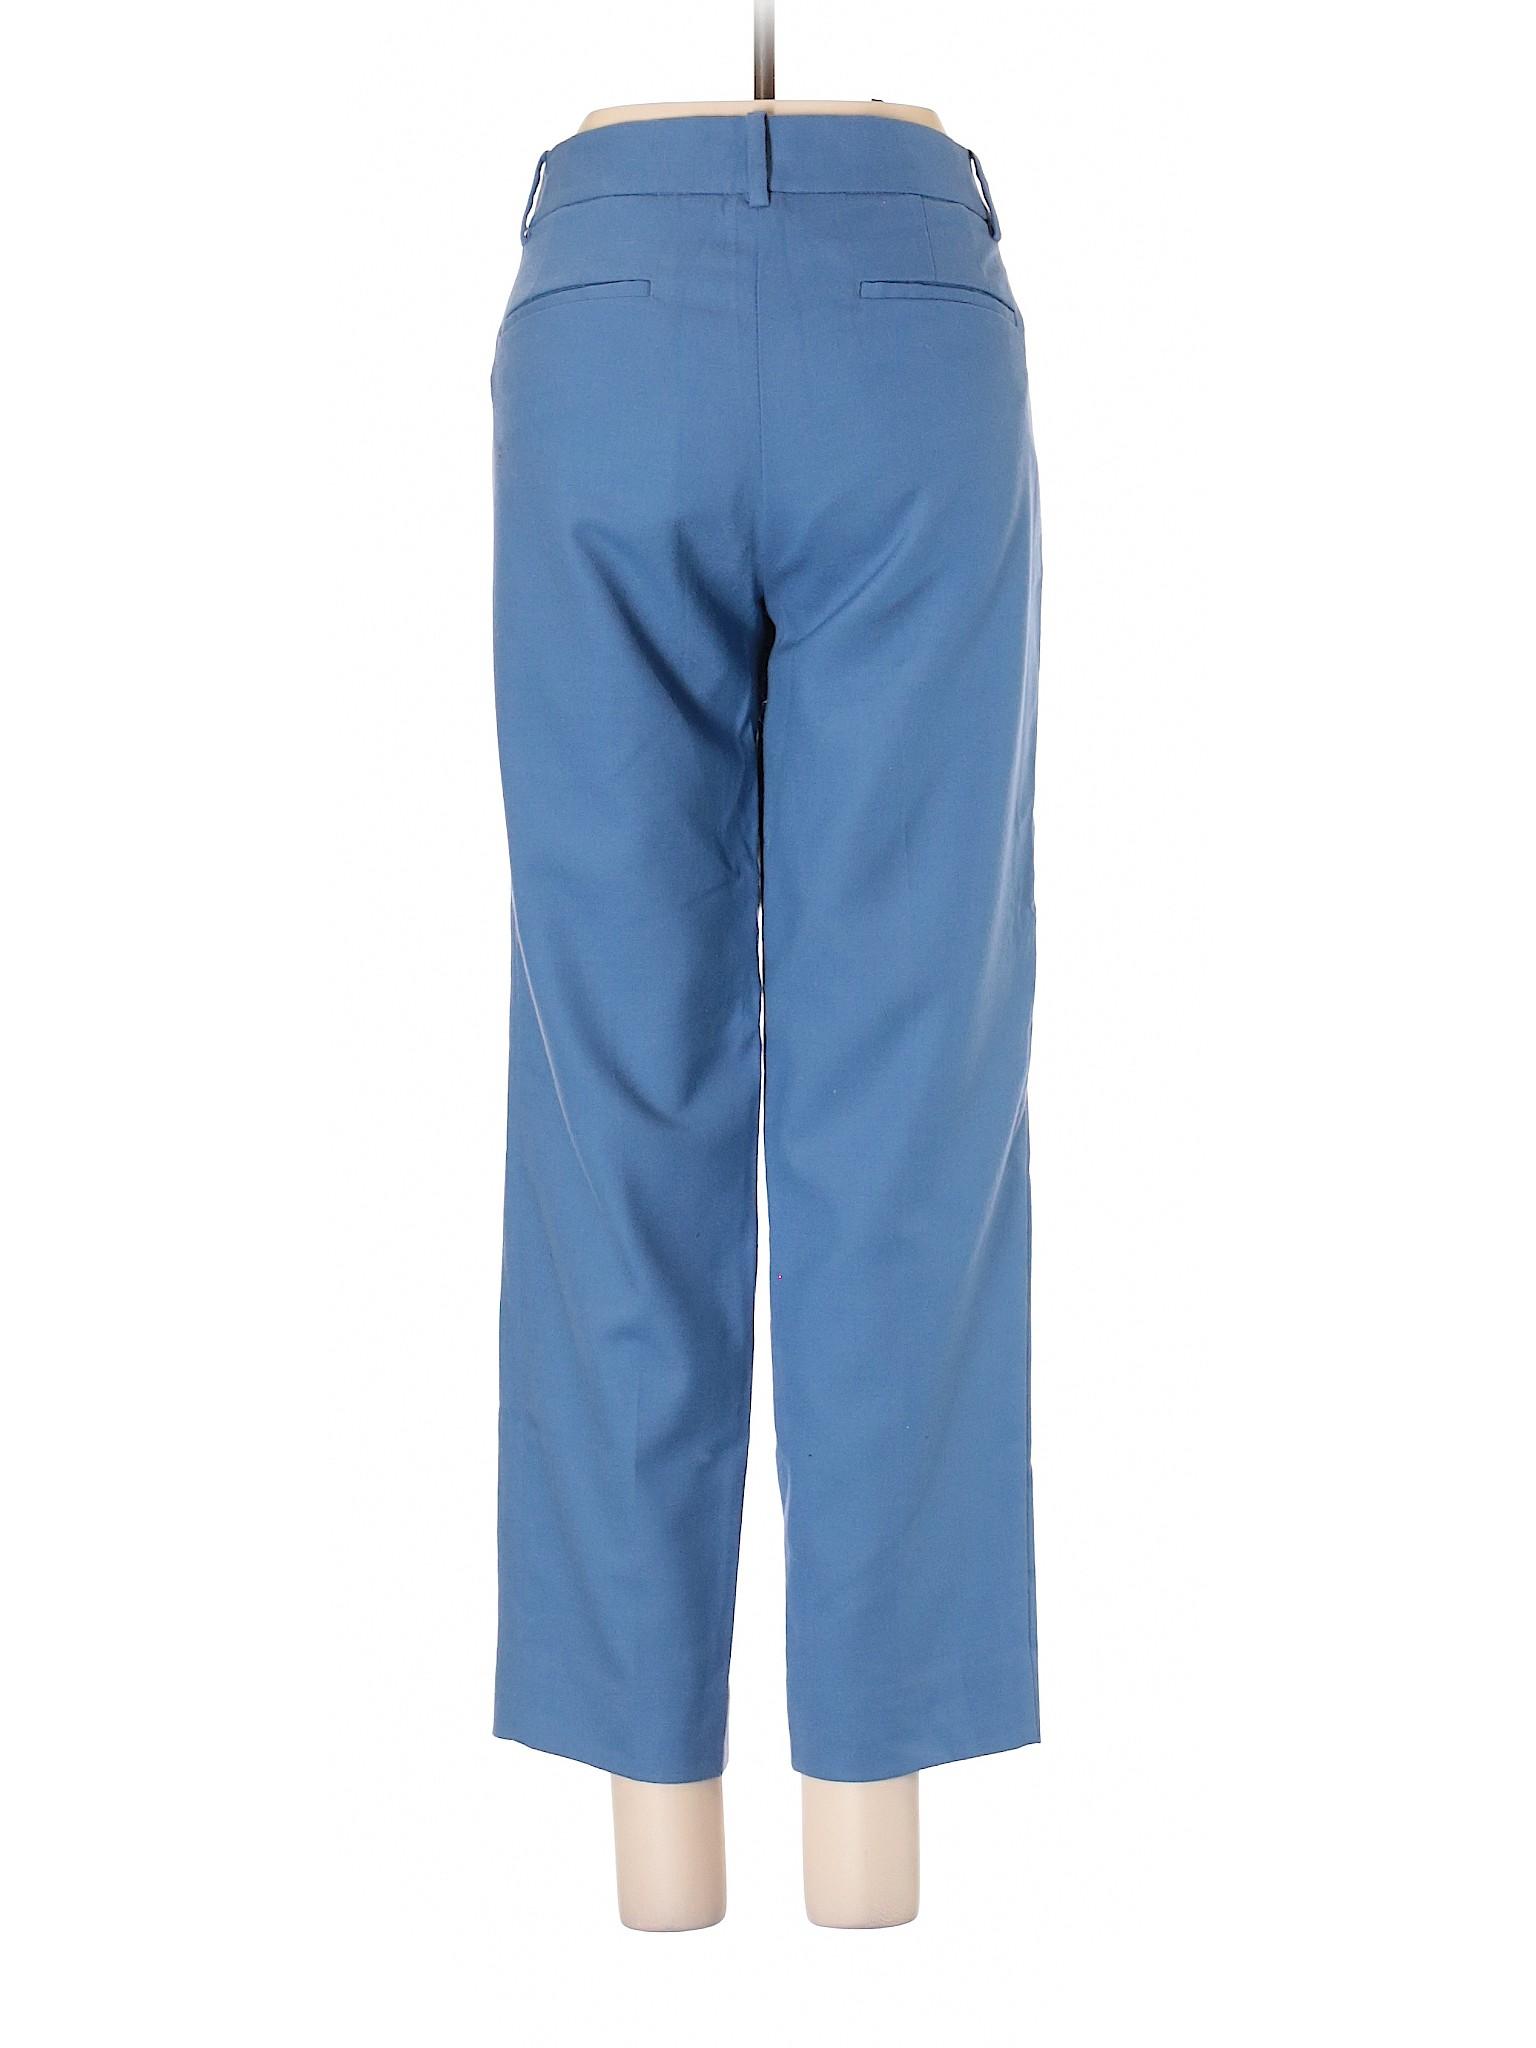 Pants winter Store Crew J Dress Leisure Factory nY1TSHdx1q